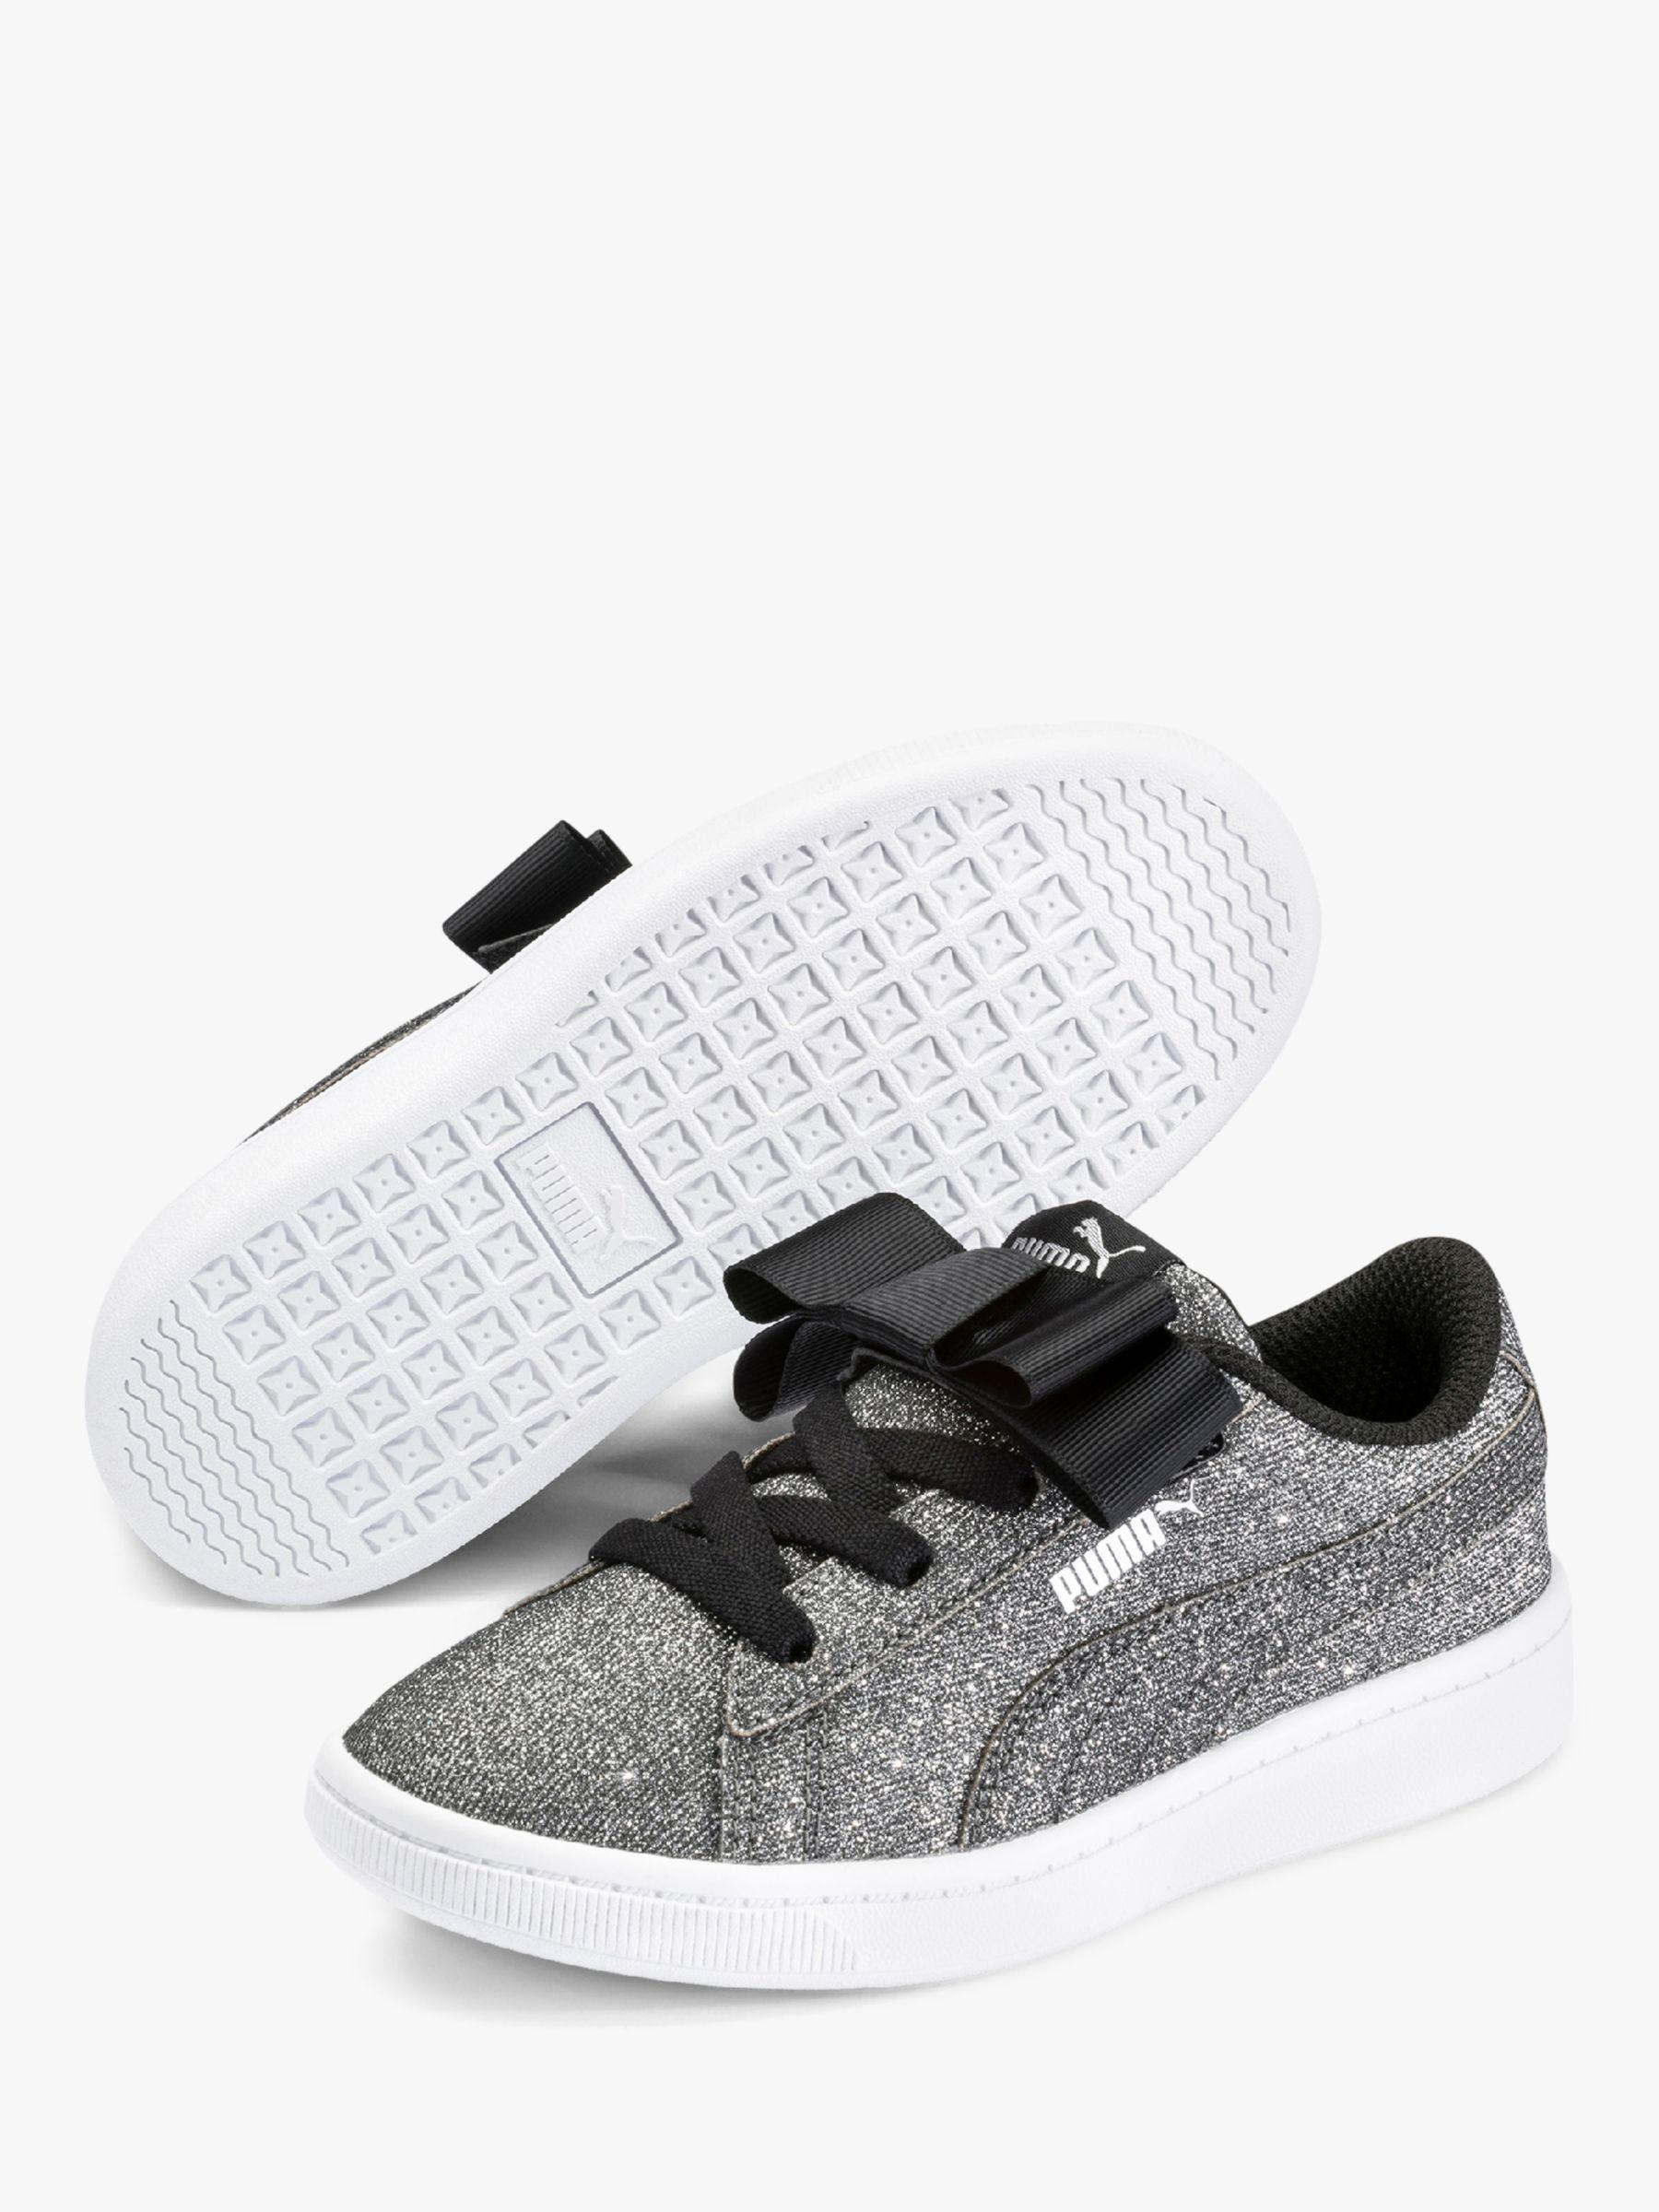 Trainers, PUMA Black/PUMA Silver/White